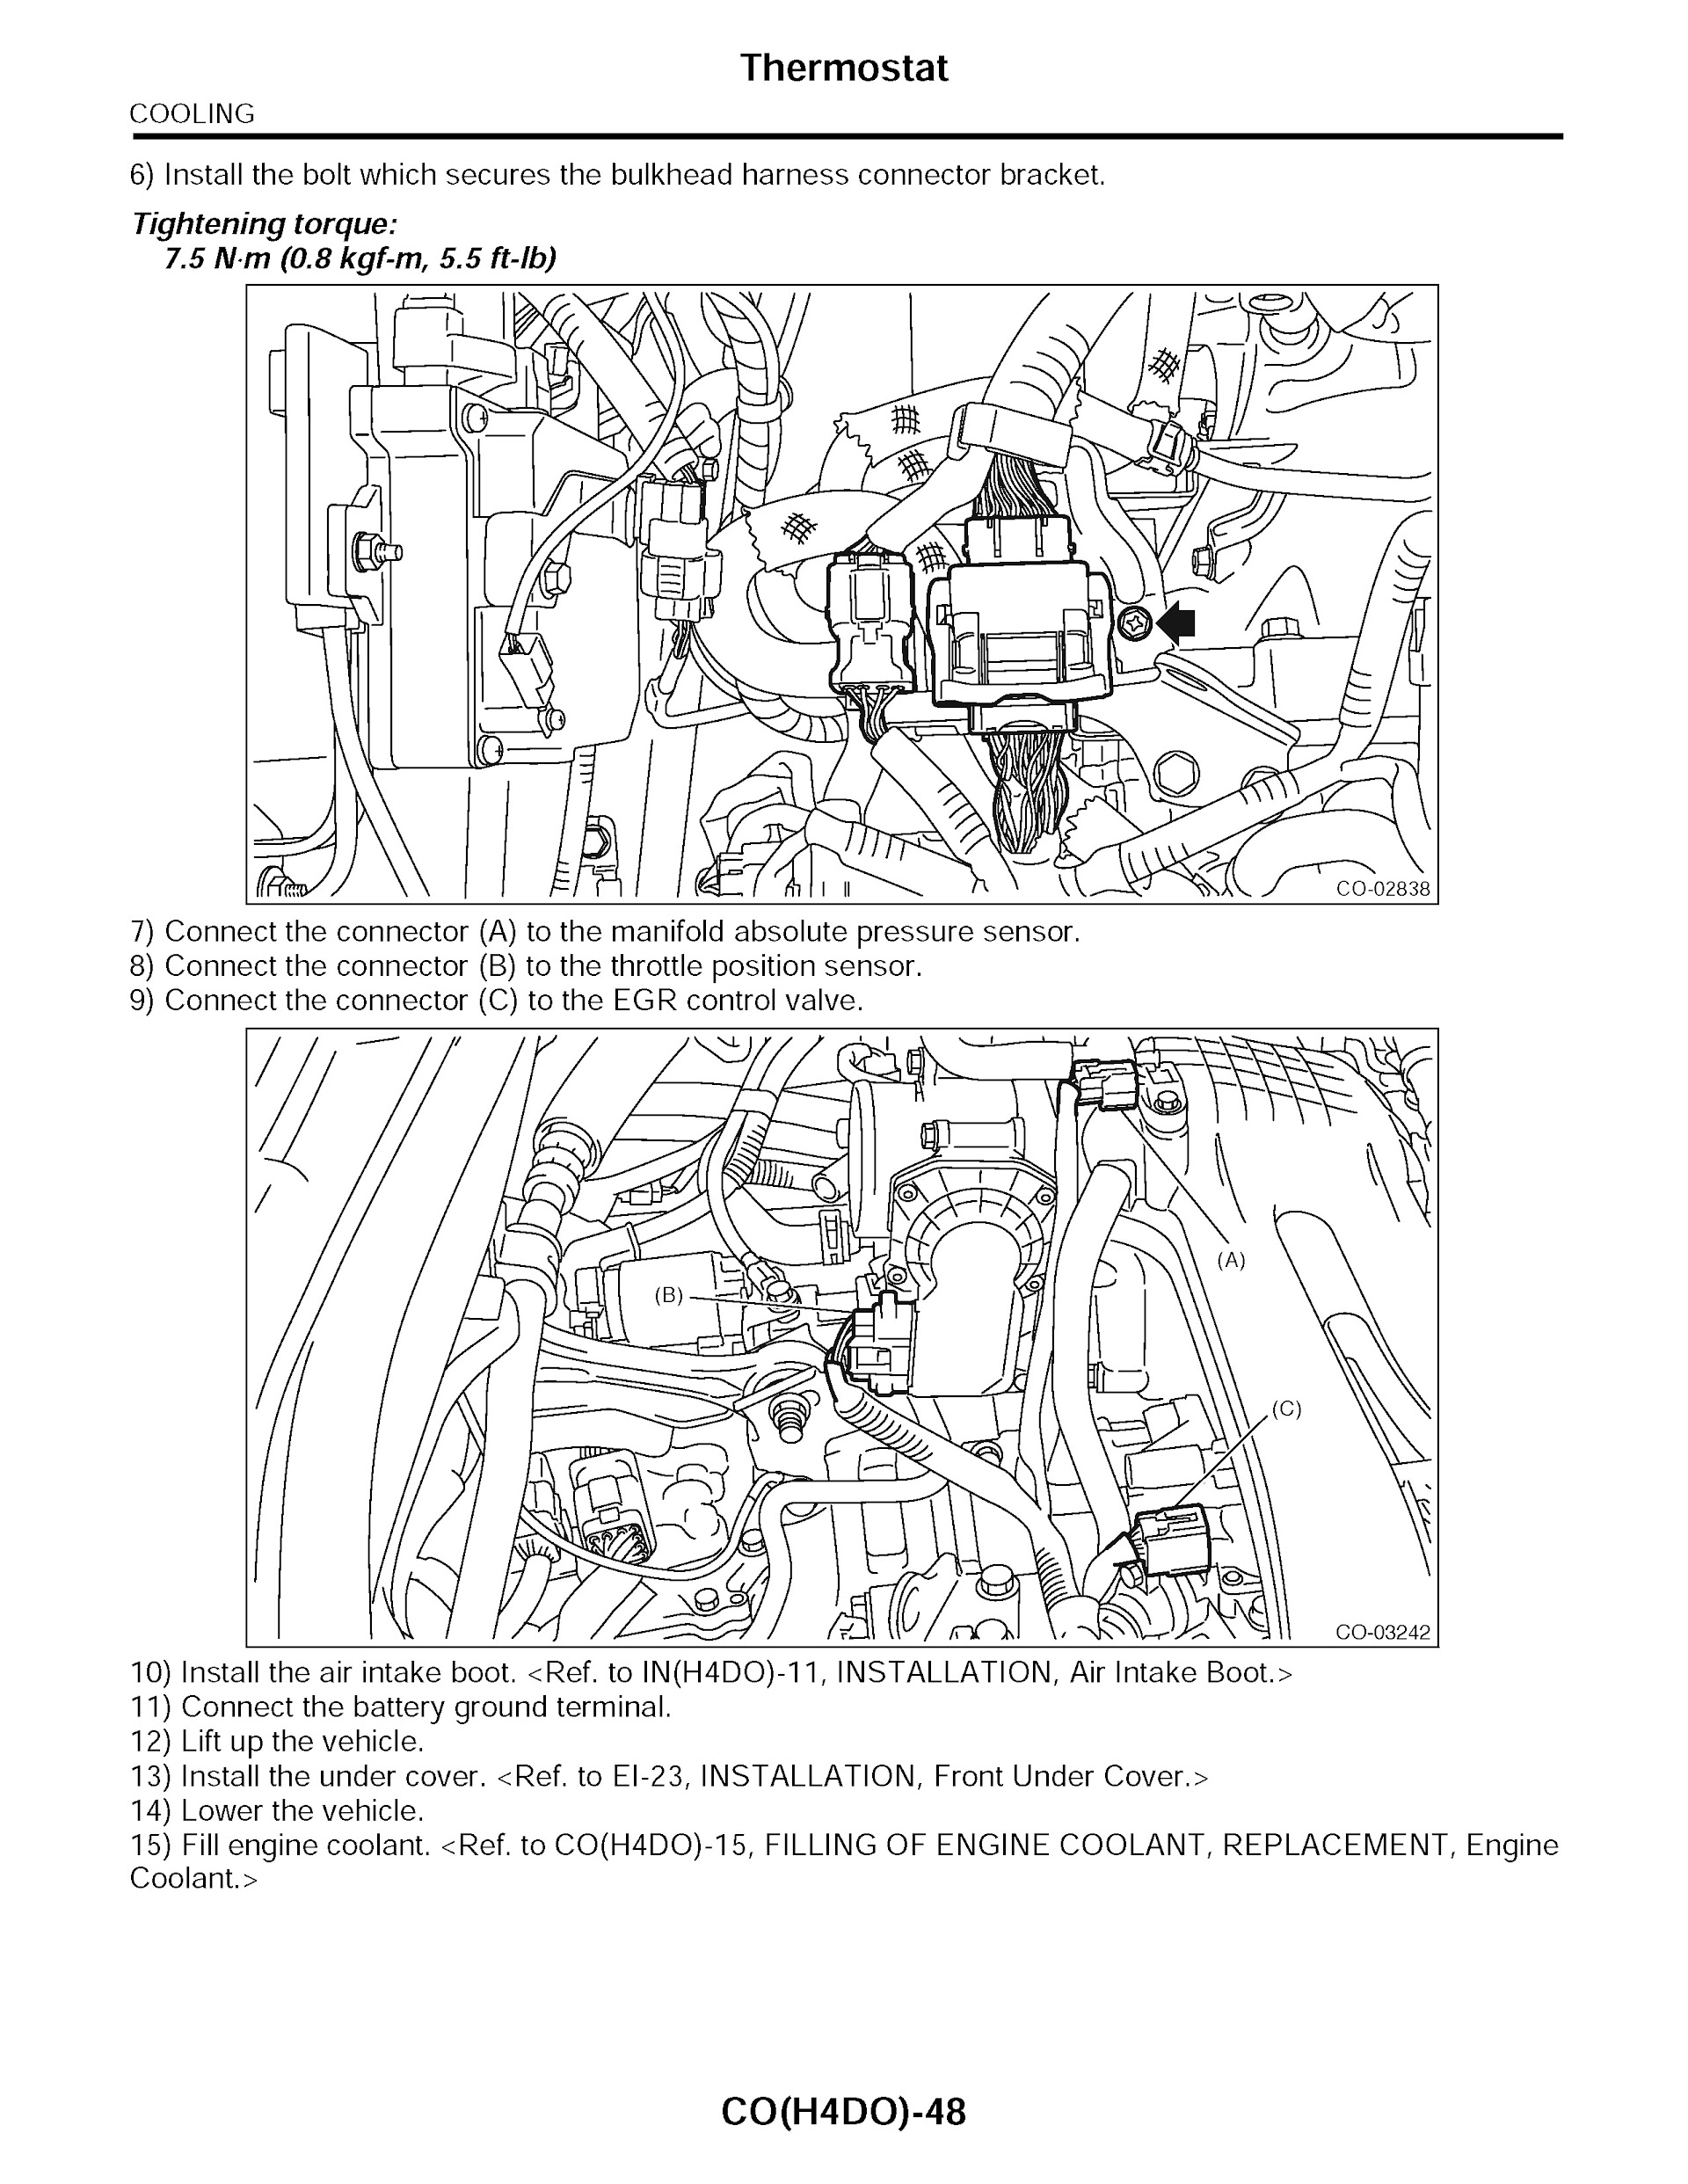 2015 Subaru Forester Service Repair Manual